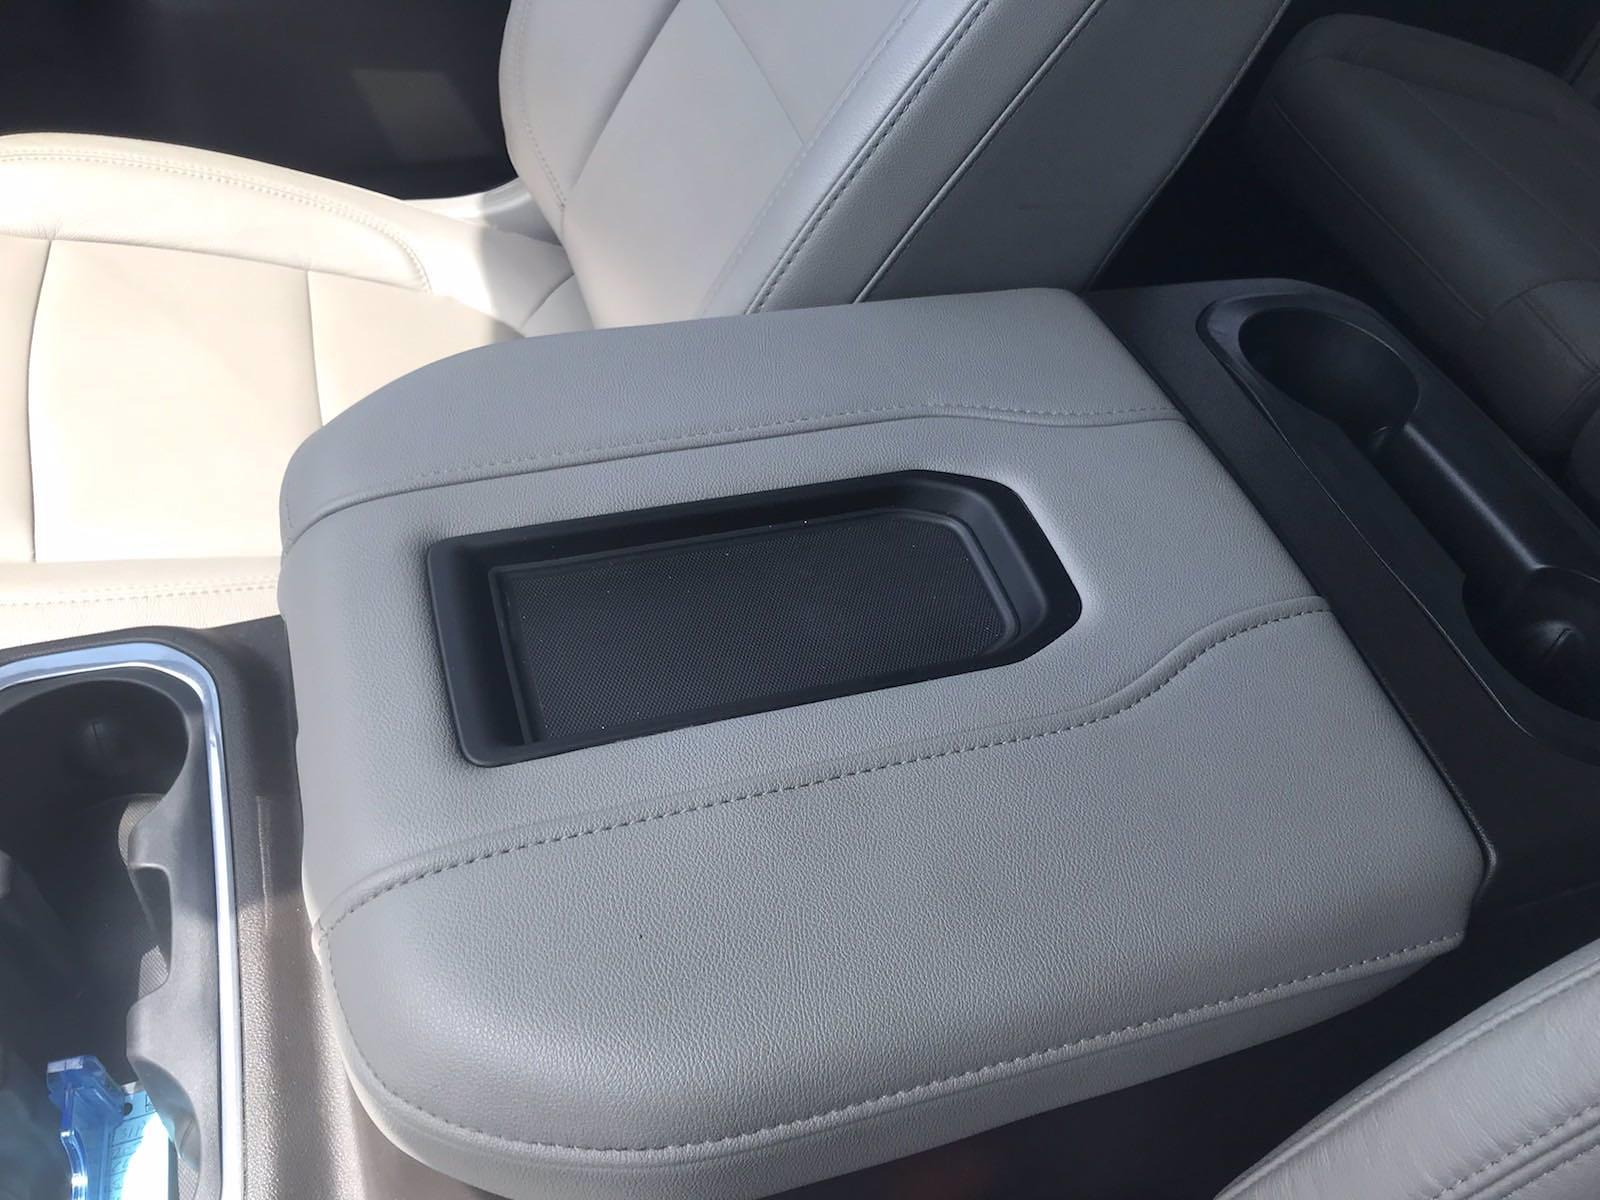 2020 Chevrolet Silverado 1500 Crew Cab 4x4, Pickup #16431PN - photo 37